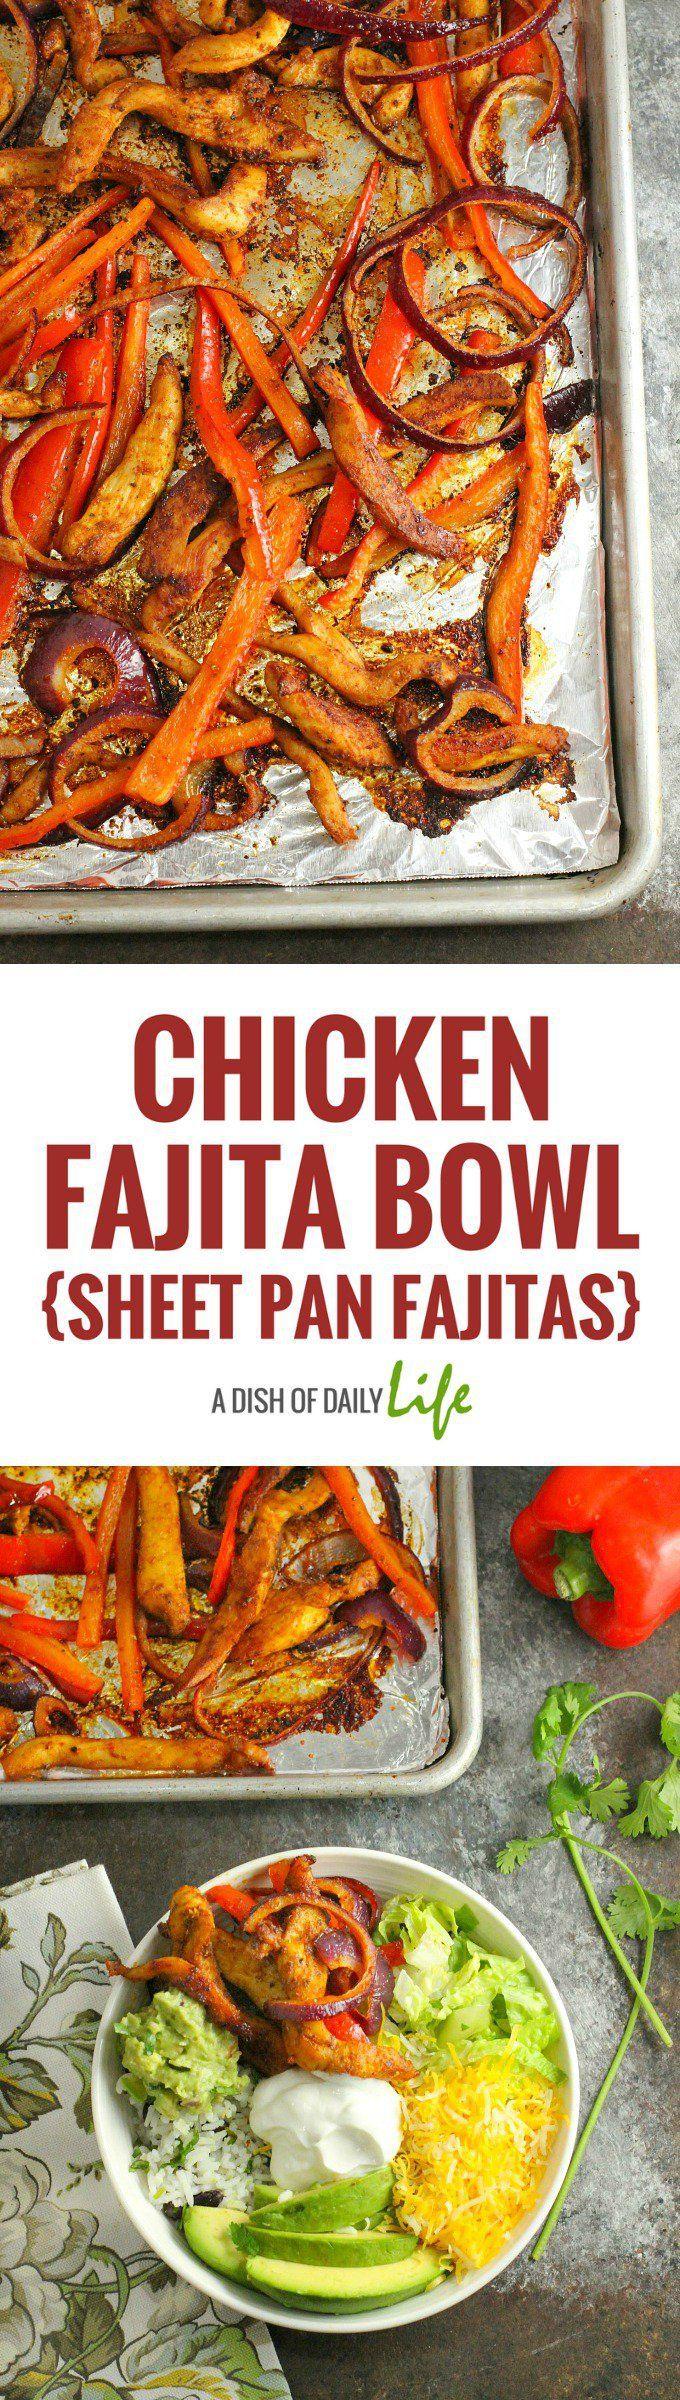 Chicken Fajita Bowls made with Sheet Pan Fajitas...healthy, easy and delicious!